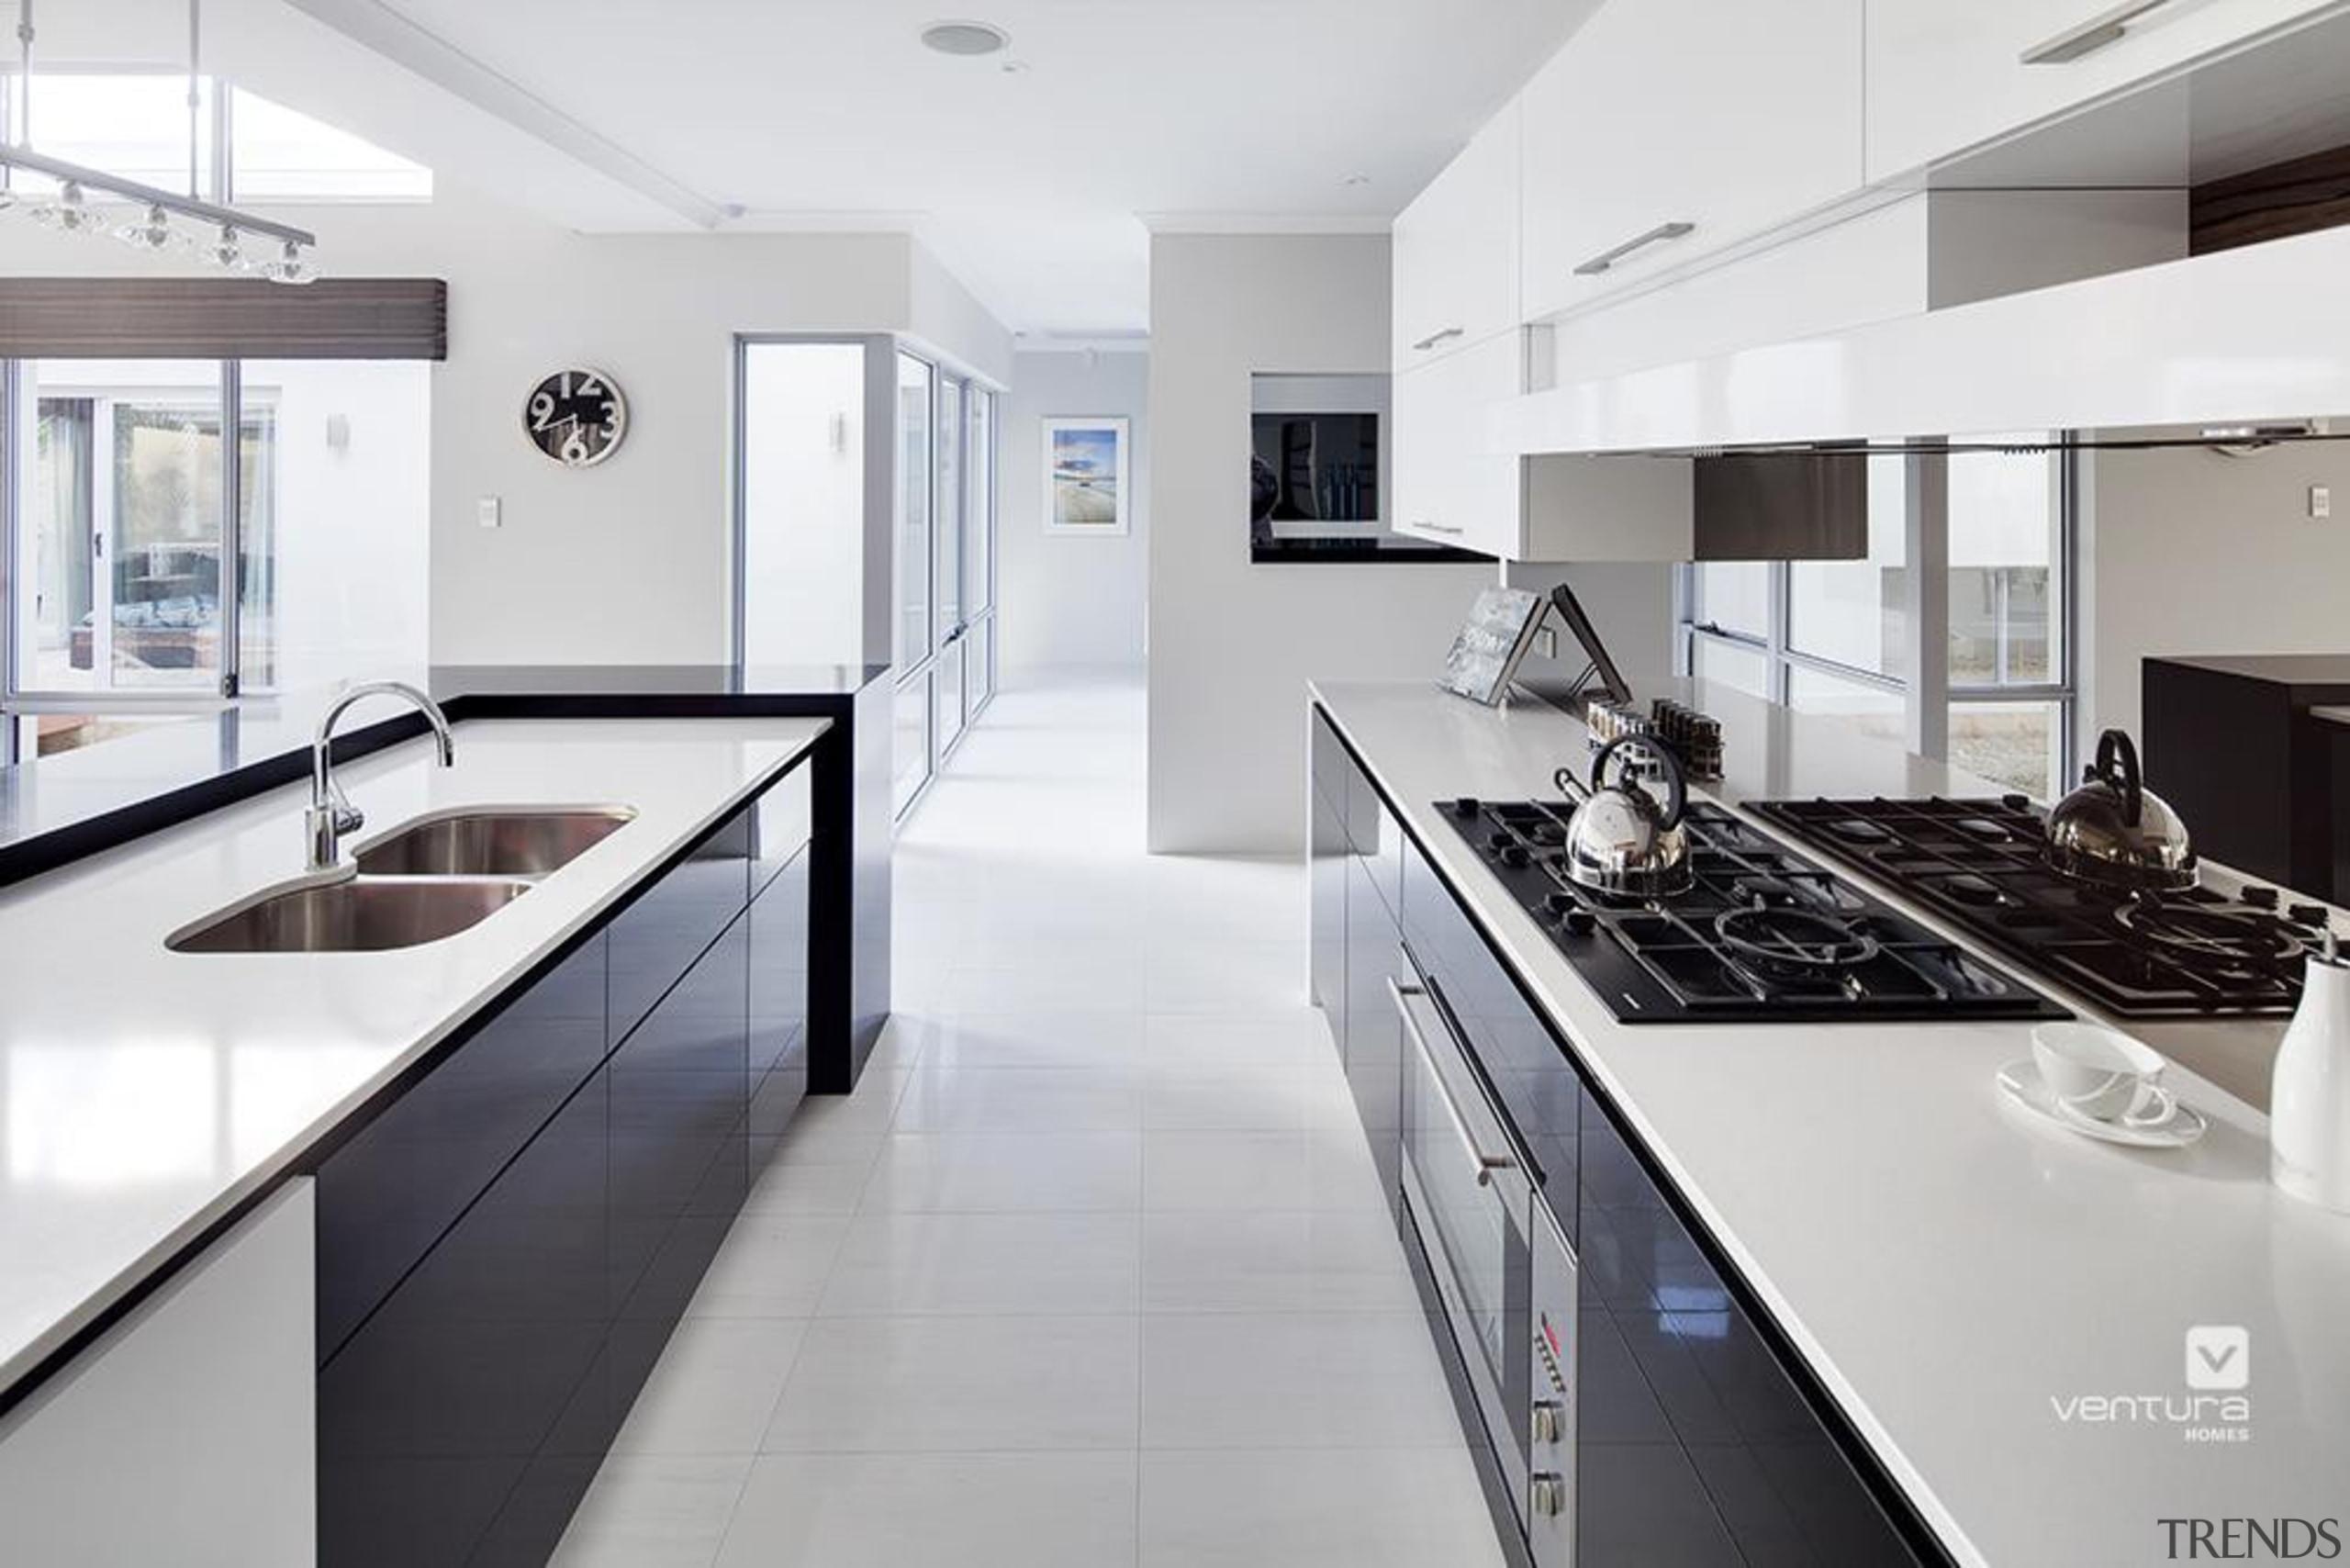 Kitchen design. - The Haven Display Home - countertop, cuisine classique, interior design, kitchen, real estate, room, white, gray